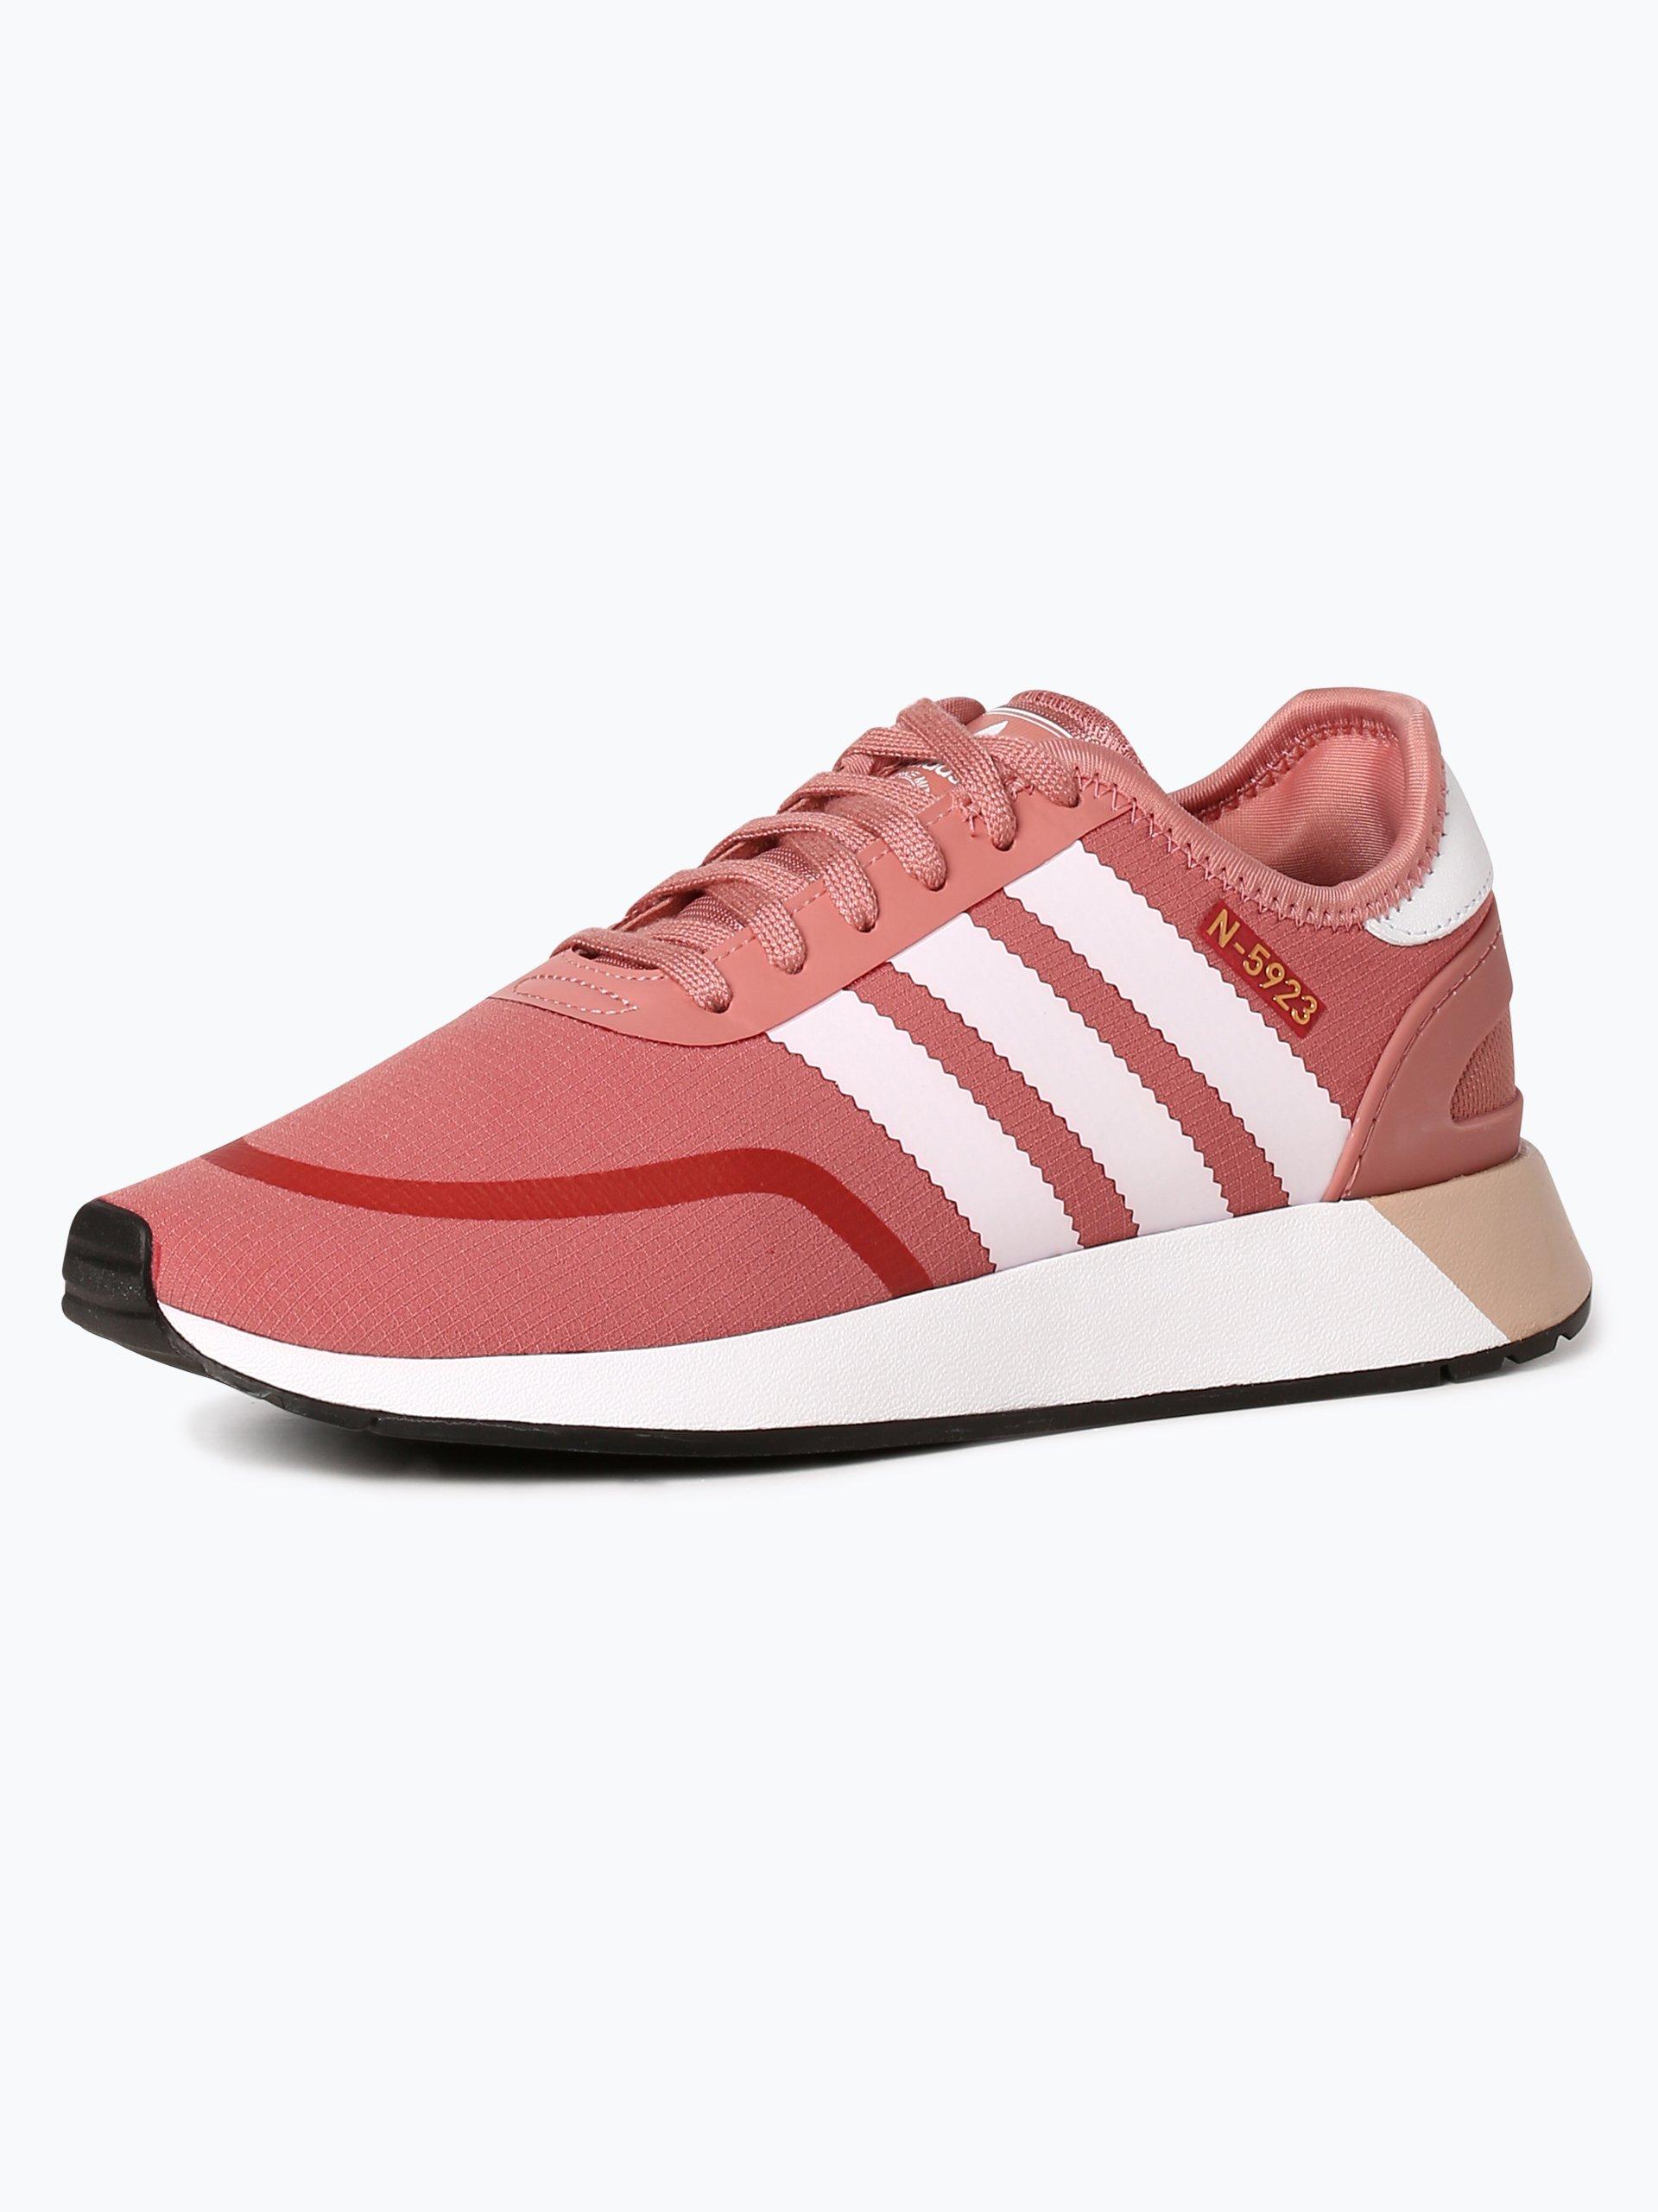 adidas Originals Tenisówki damskie – N-5923